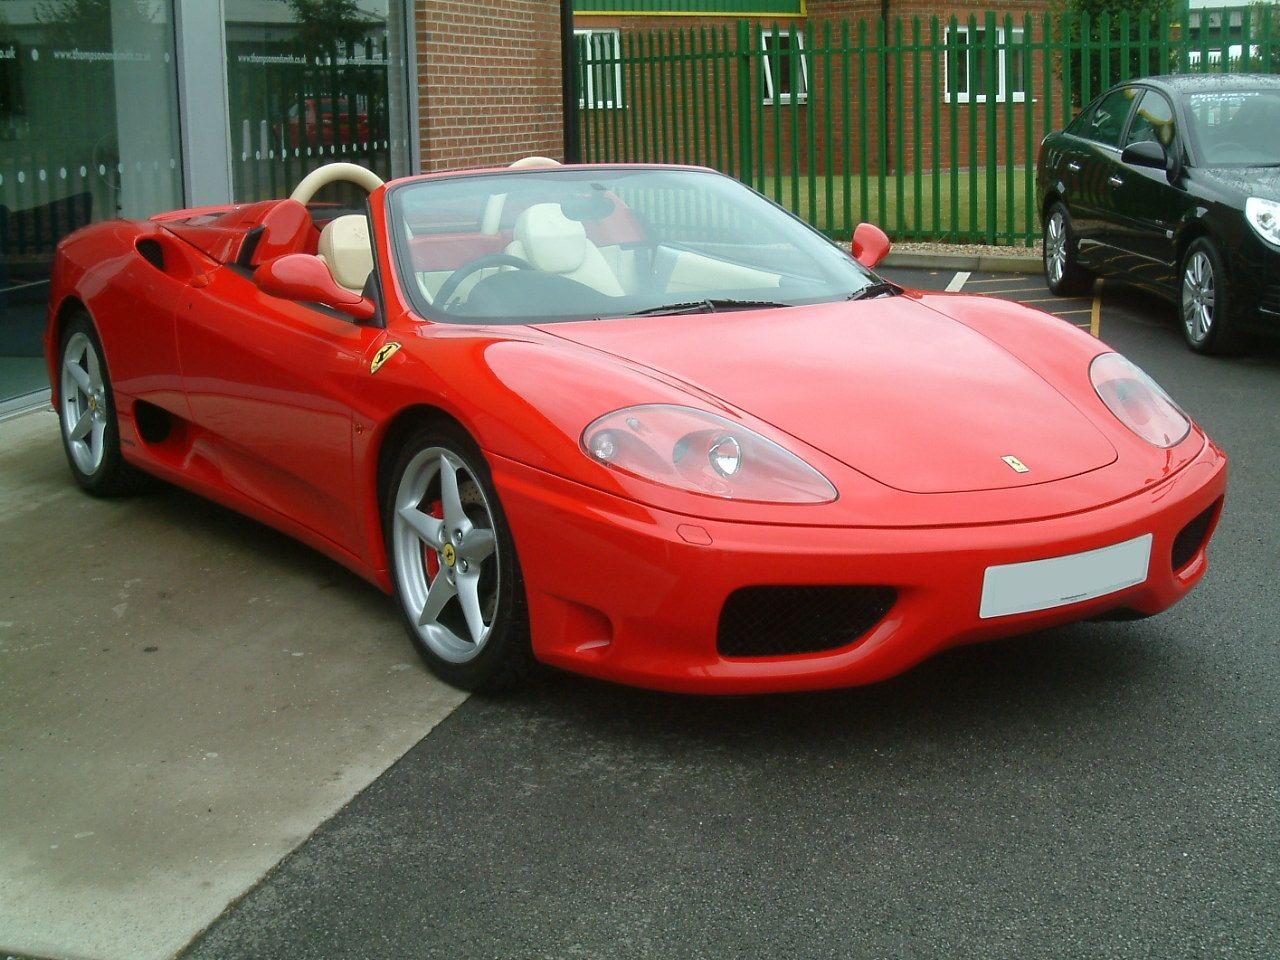 2004 Ferrari 360 Spider Manual At Www Woldsideclassics Co Uk With